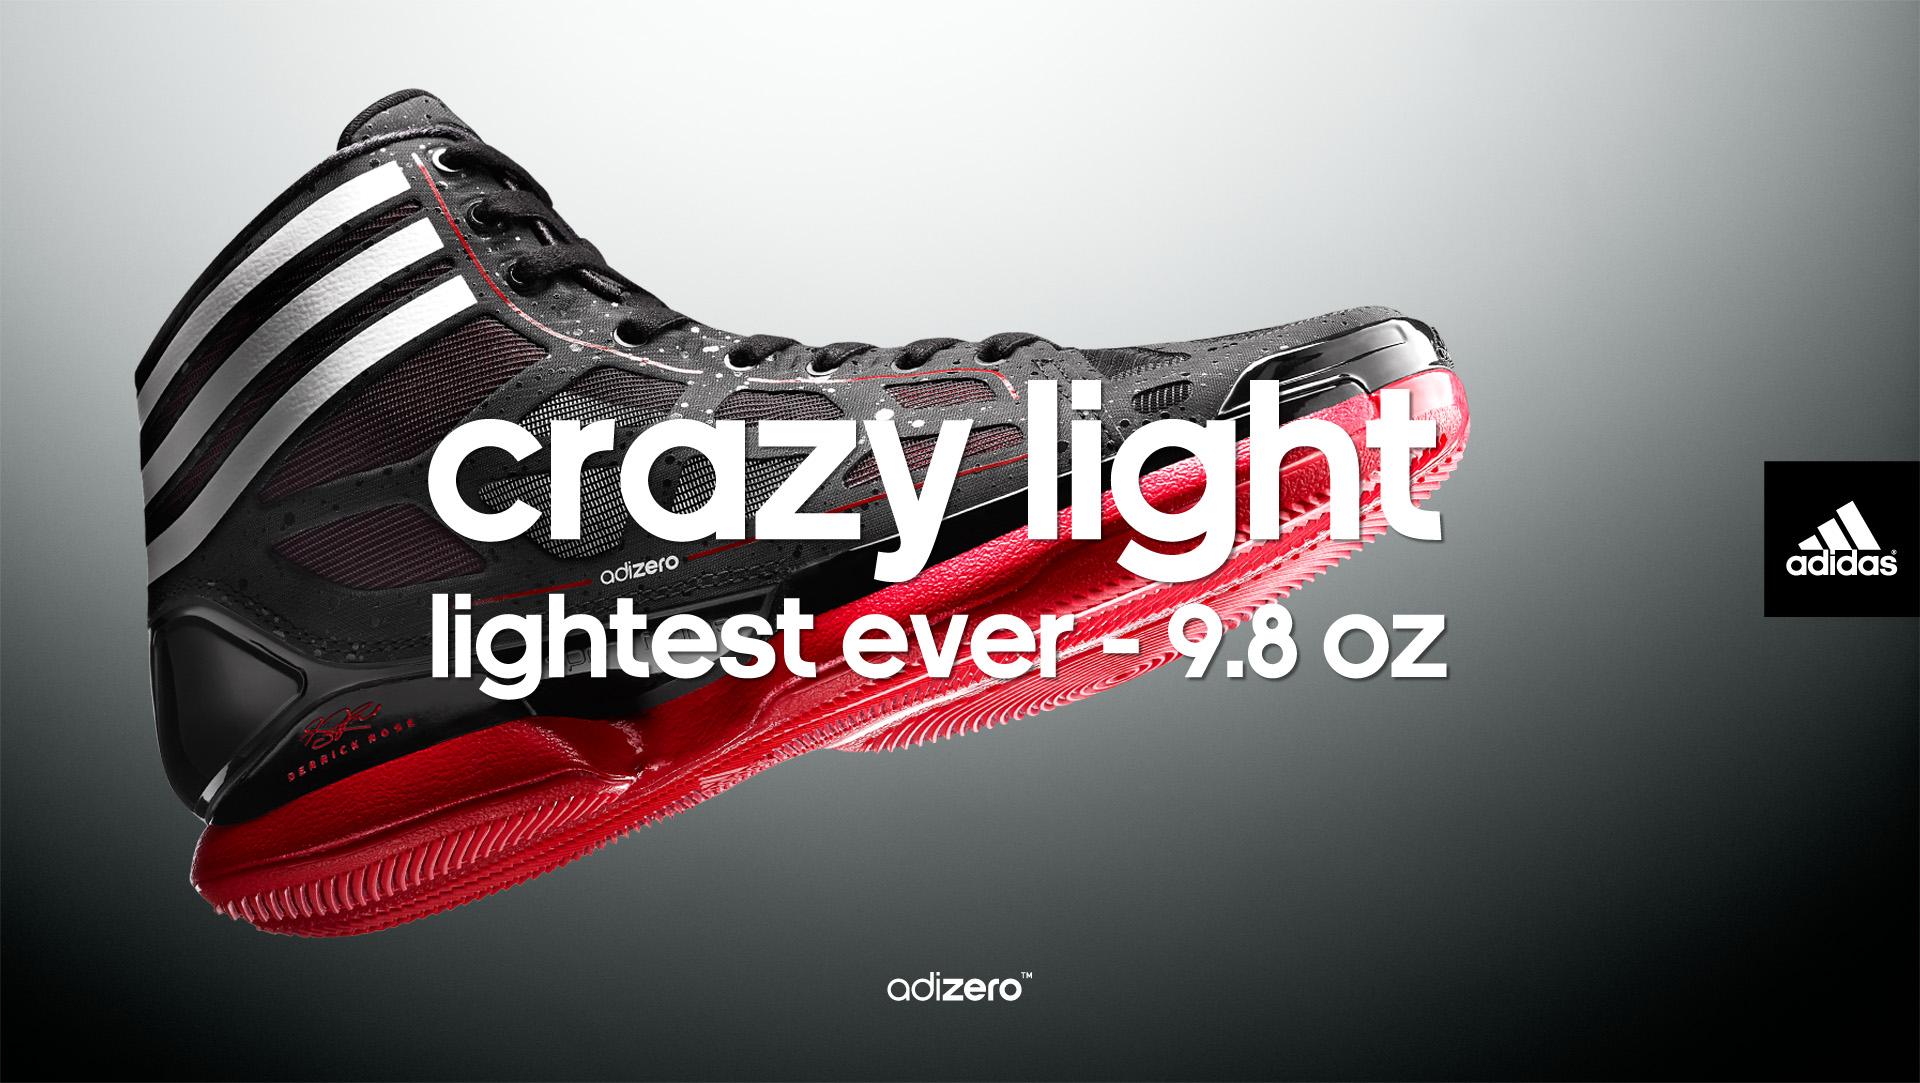 Adidas AdiZero Crazy Light Derrick Rose Wallpaper 1920x1083